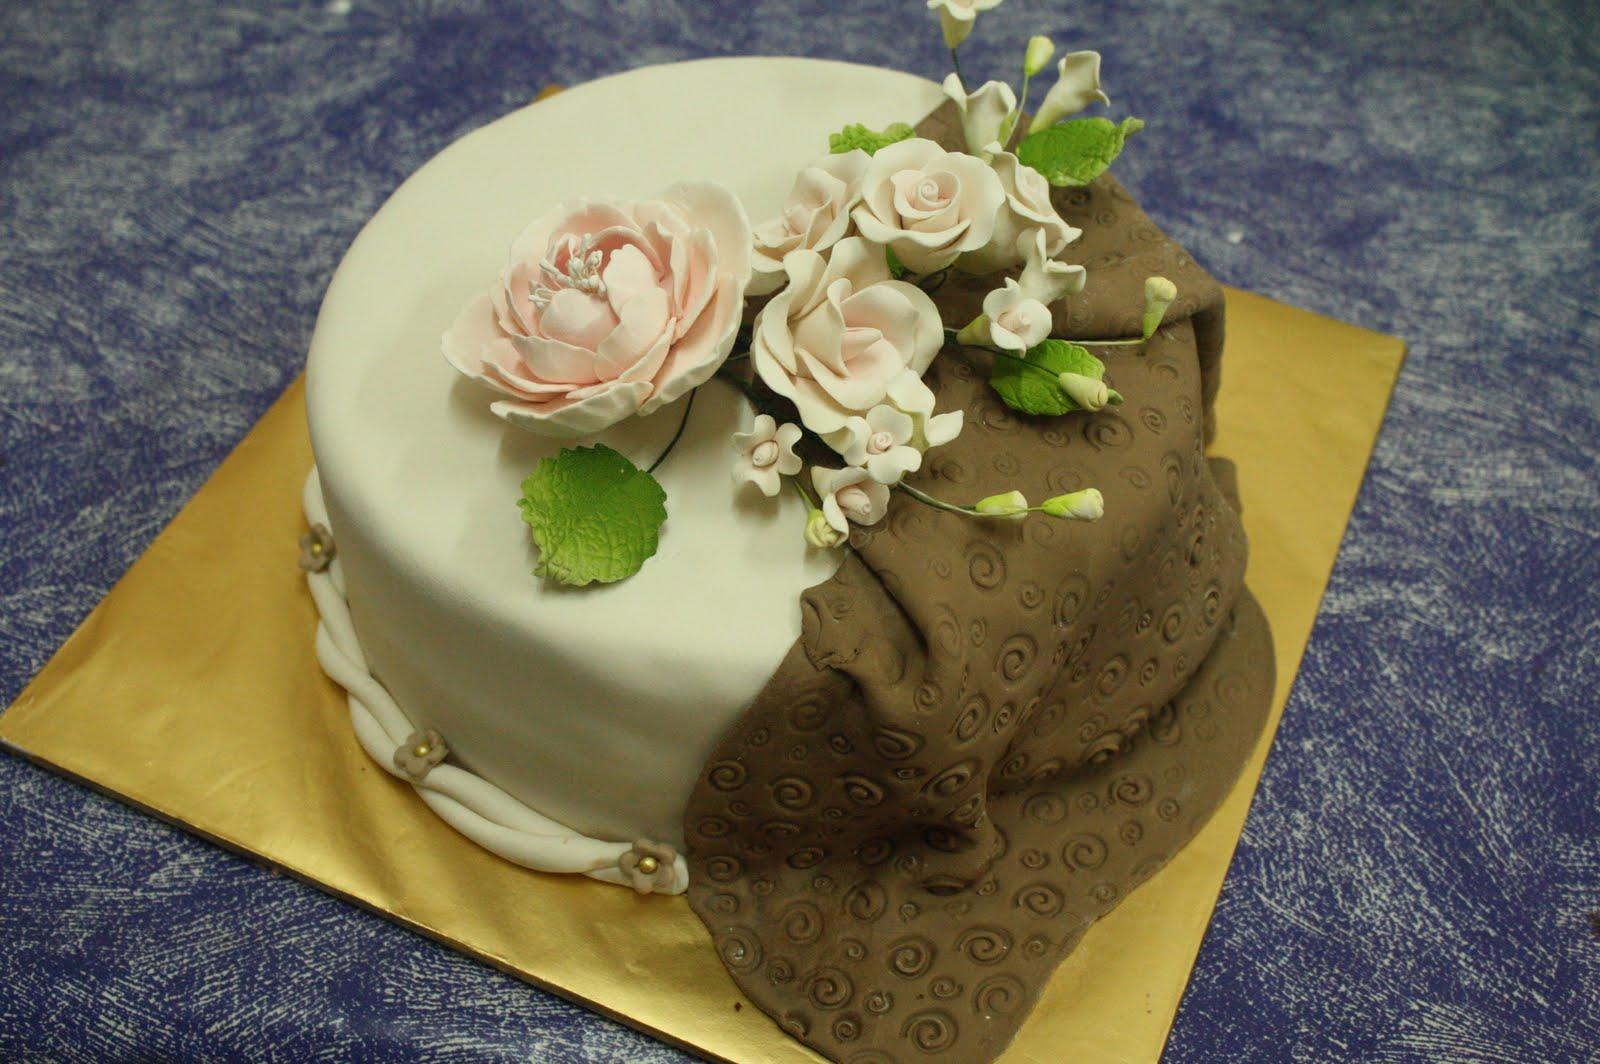 Brown & Ivory Wedding Cake